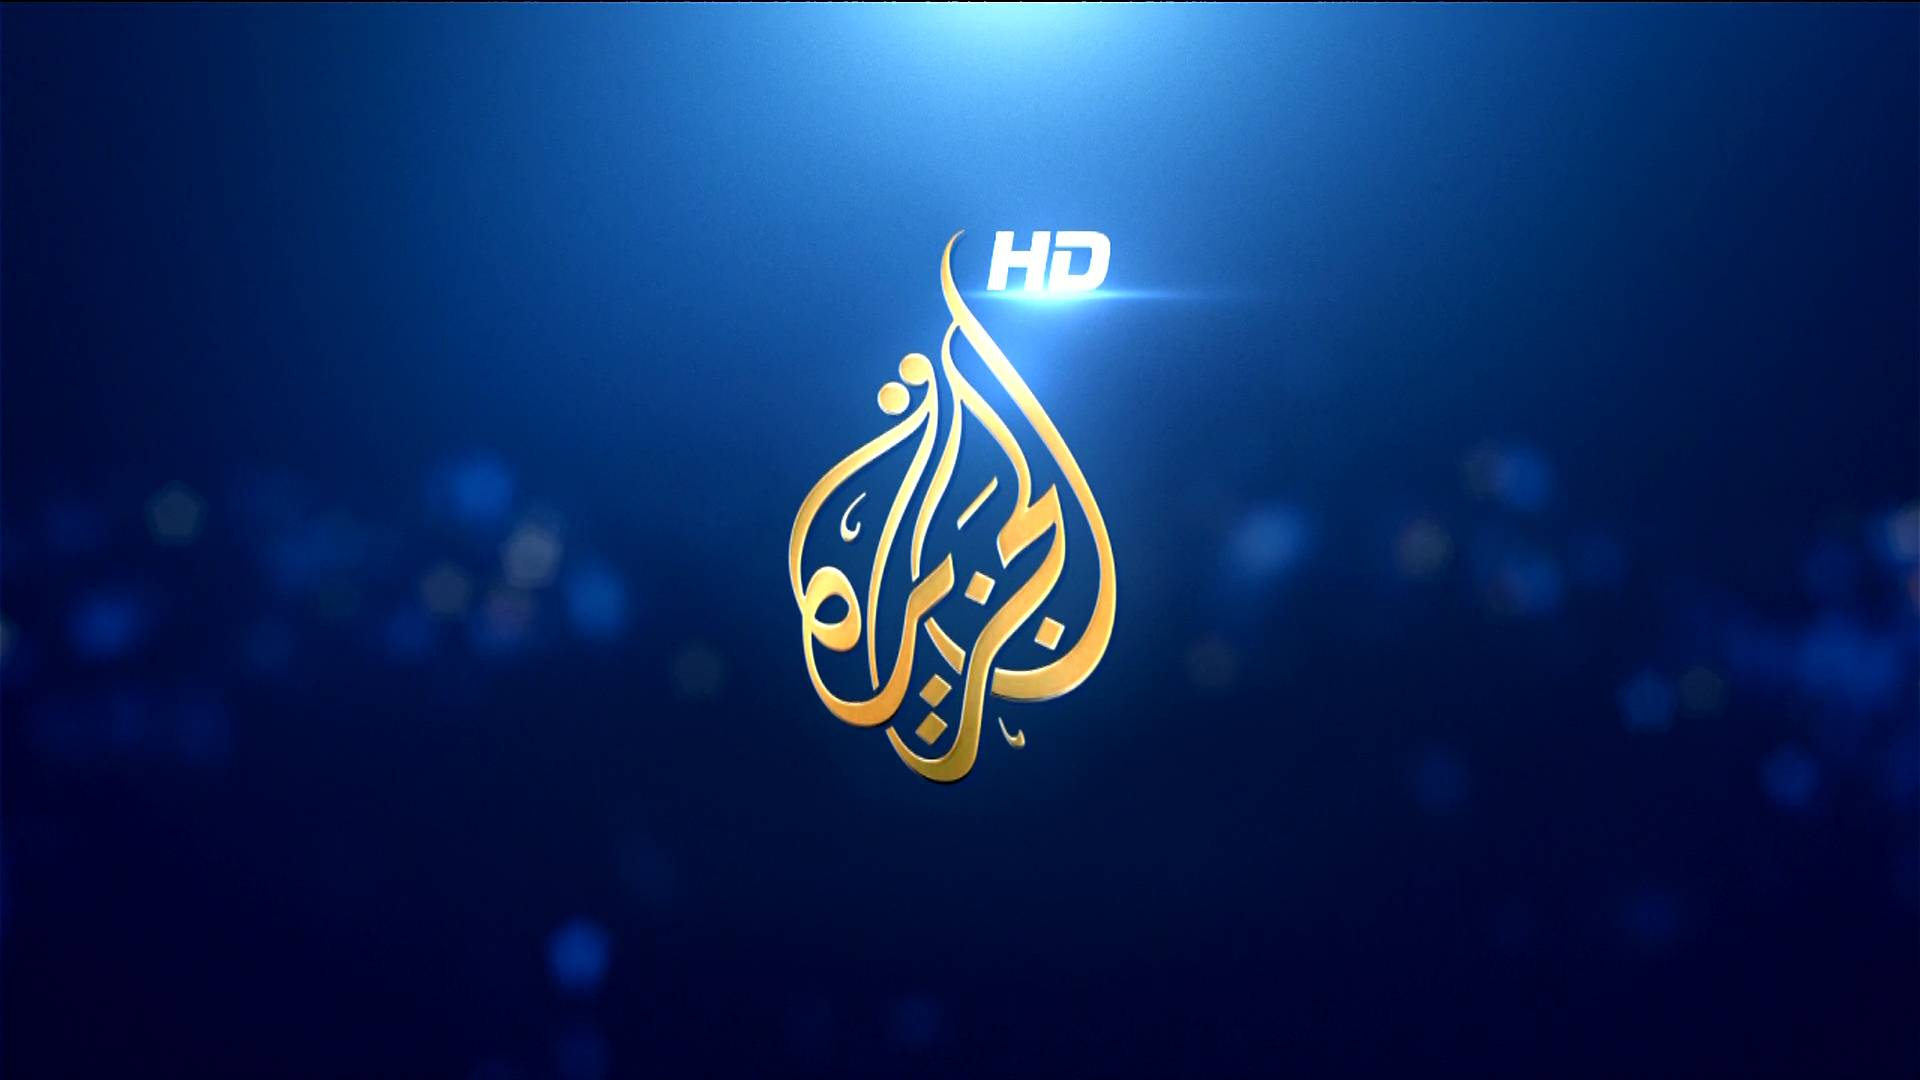 تردد قناة Aljazeera HD ,Aljazeera HD,تردد قناة Aljazeera HD على نيل سات 2013